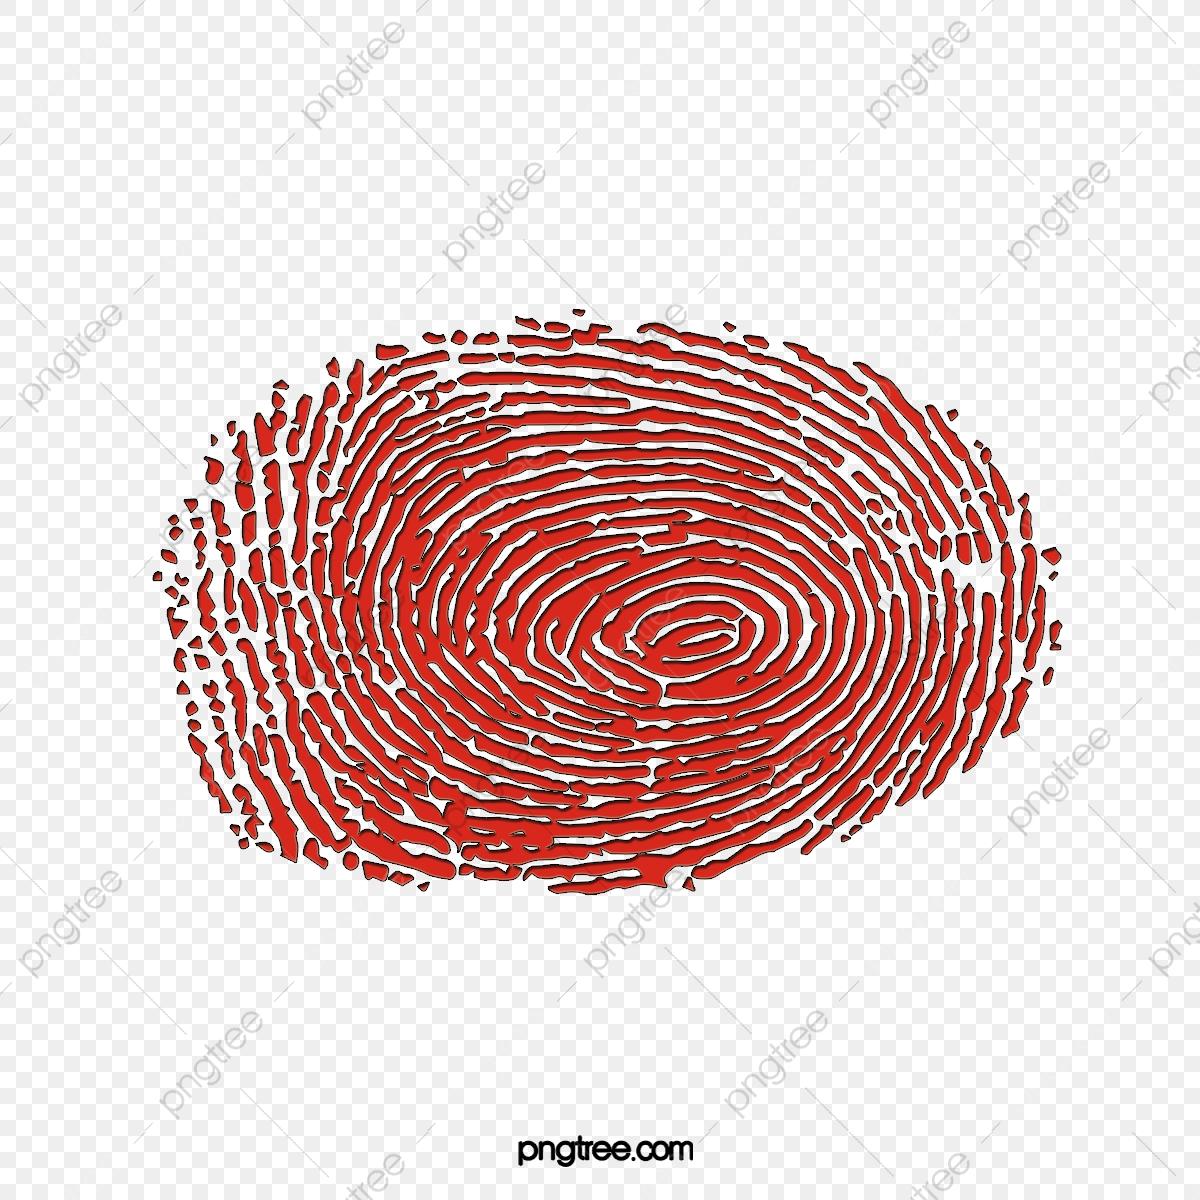 Fingerprints beautiful scan the. Fingerprint clipart red